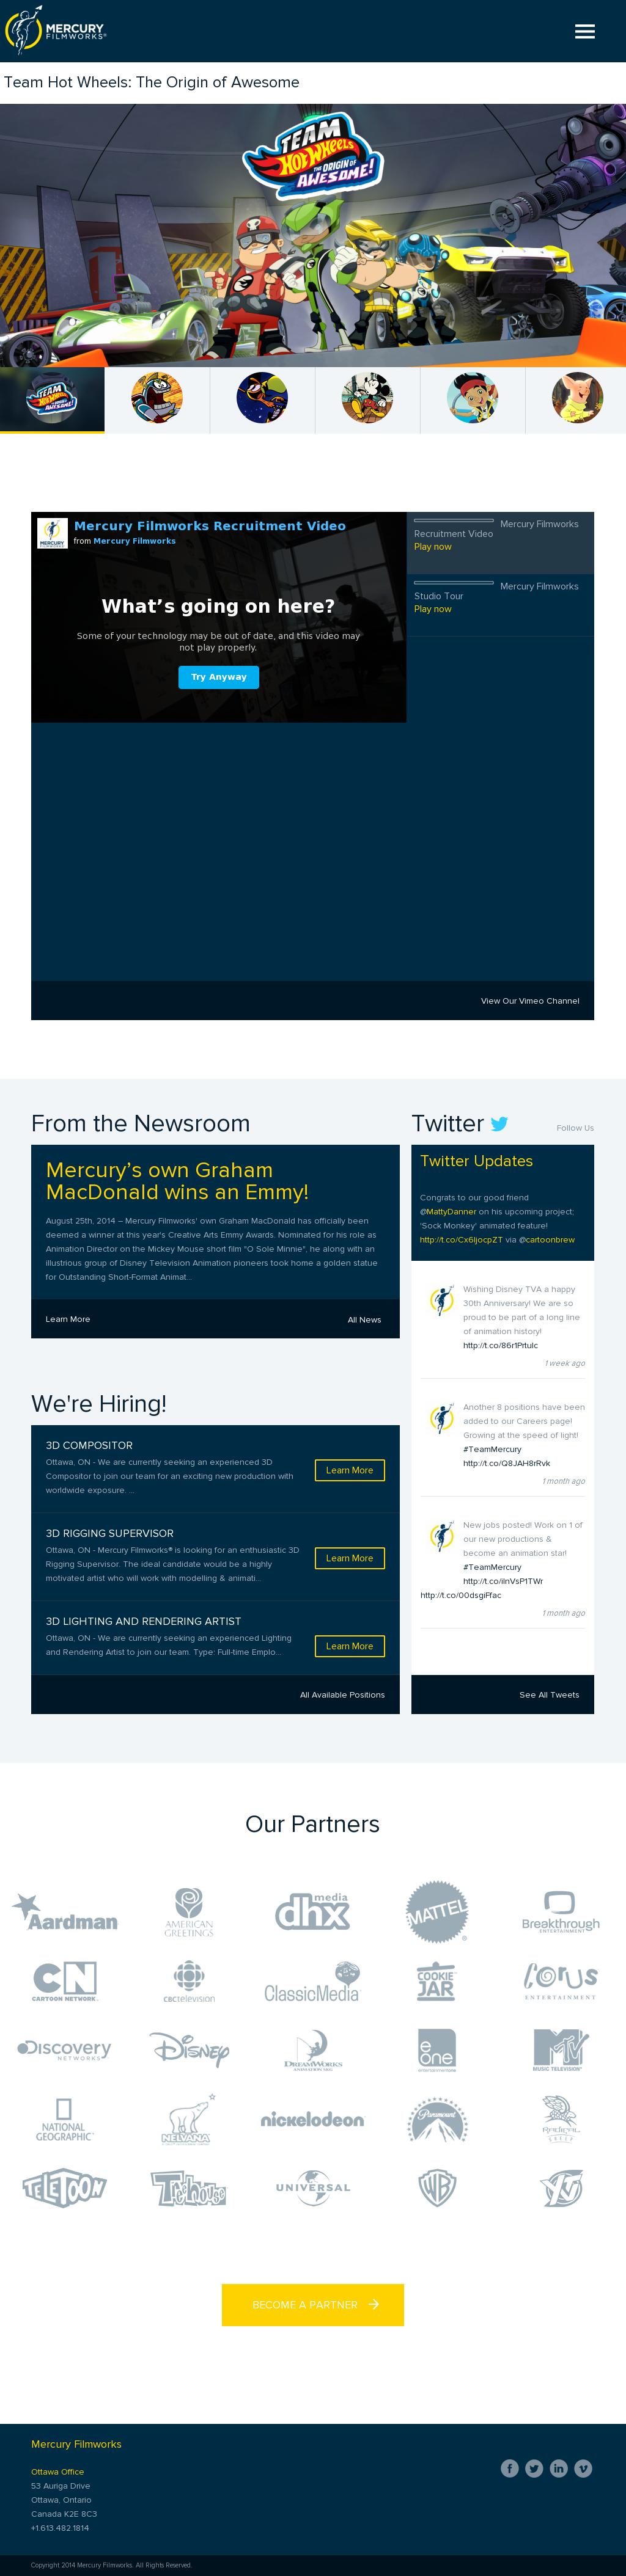 Mercury Filmworks Competitors, Revenue and Employees - Owler